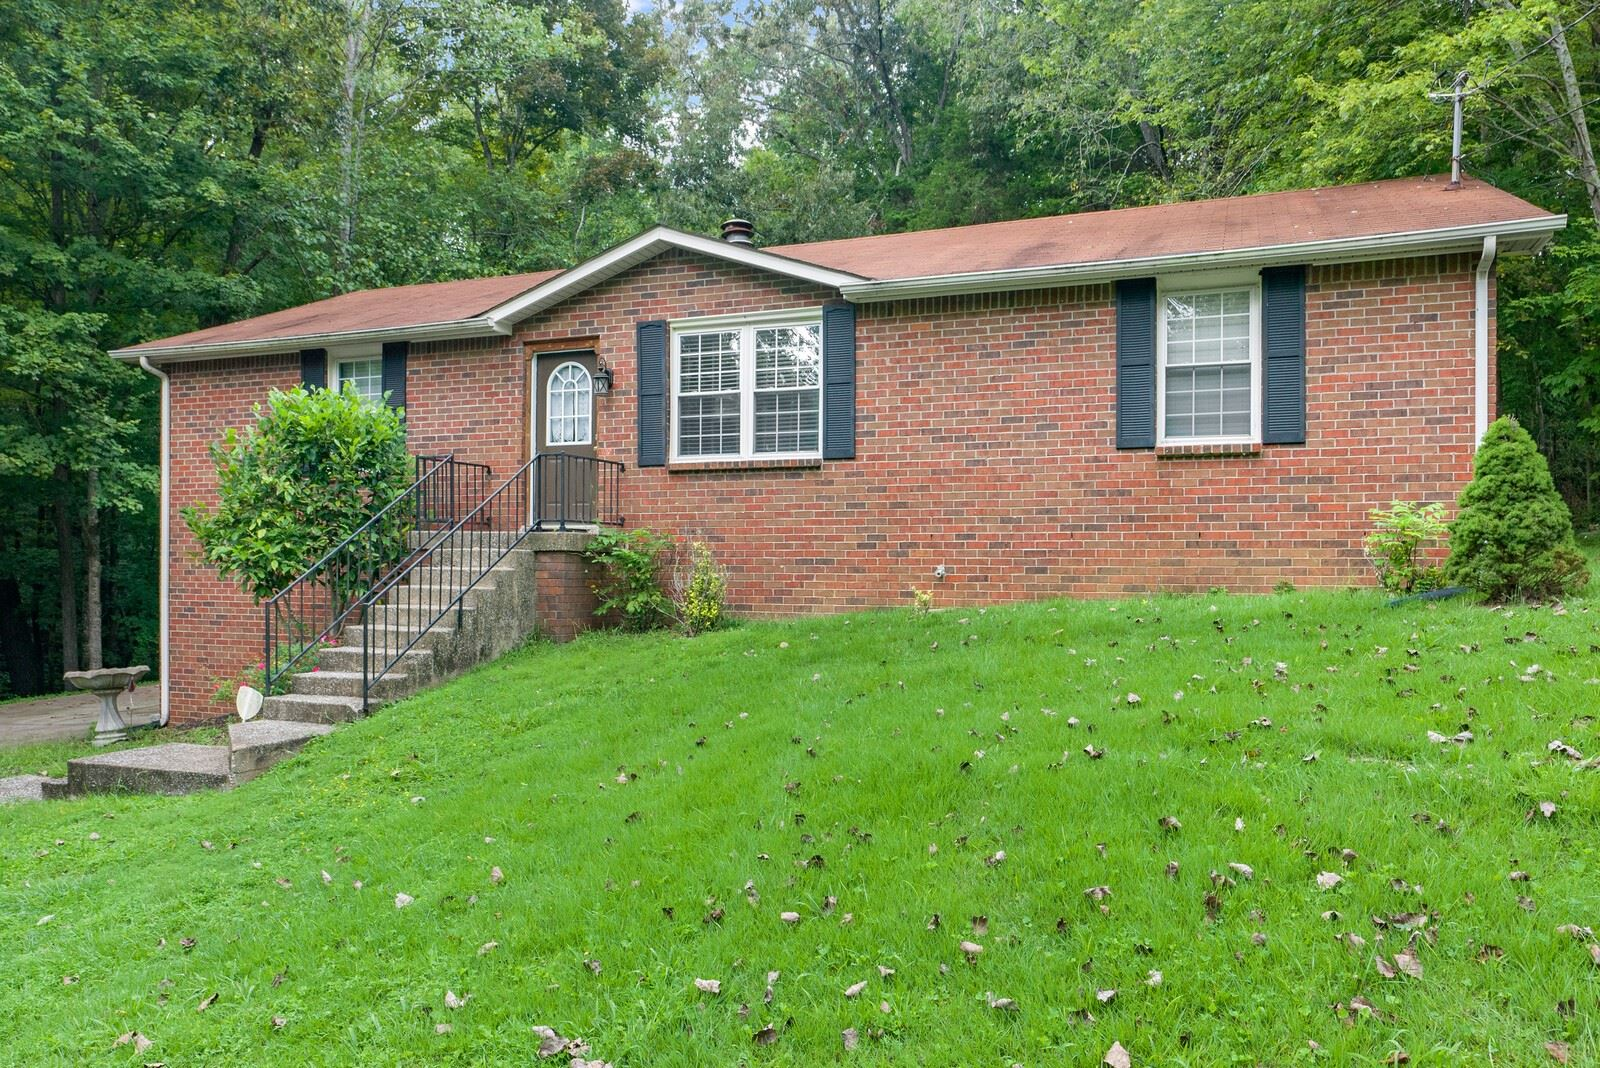 675 Chesterfield Cir, Clarksville, TN 37043 - MLS#: 2292156